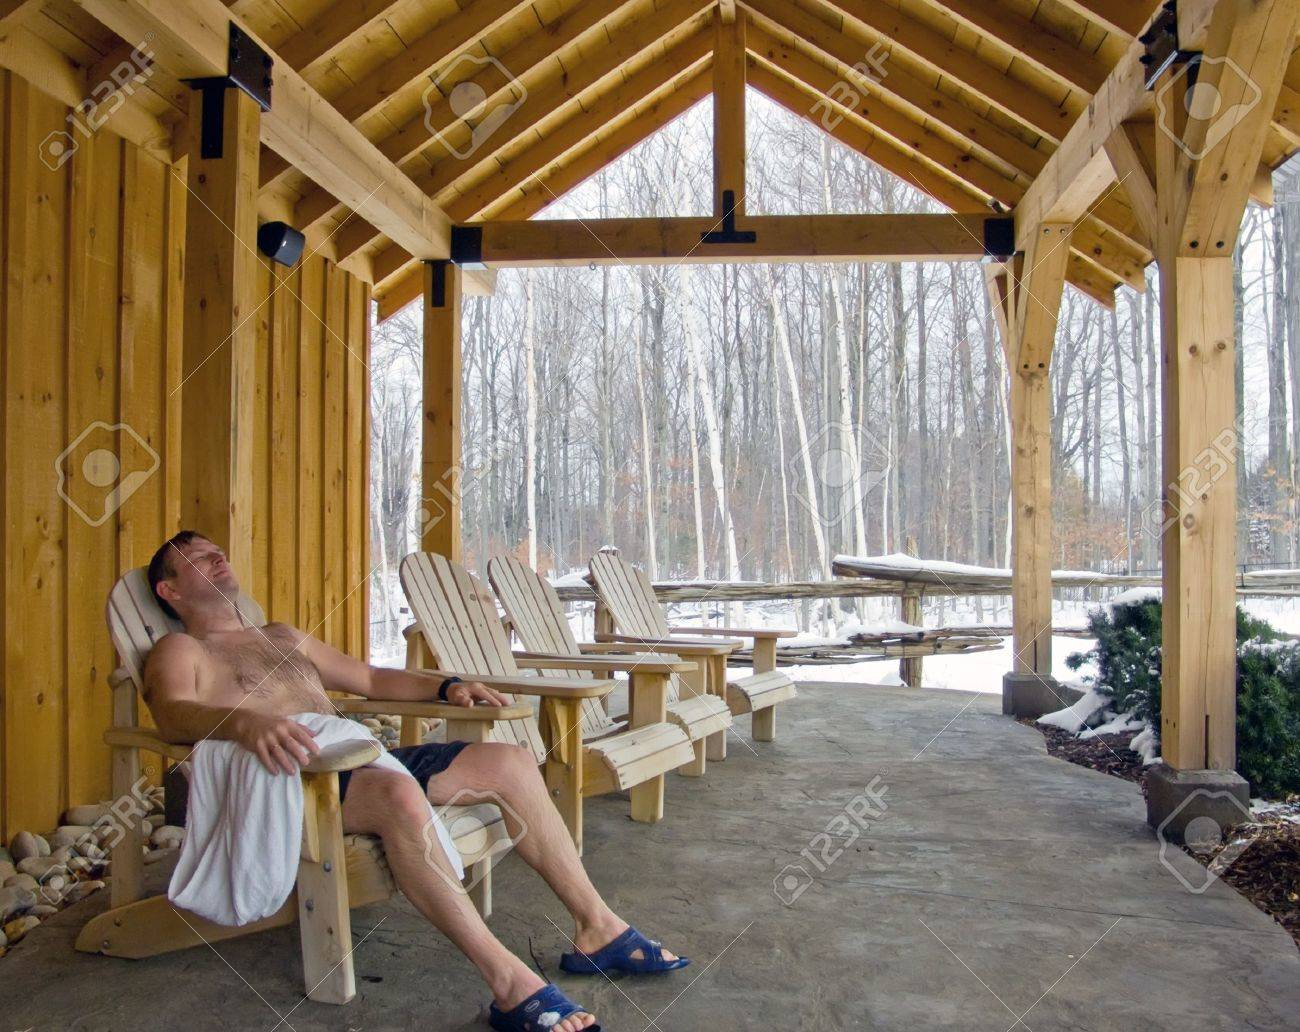 Man relaxing outdoor in spa. Winter, snow. - 5420525